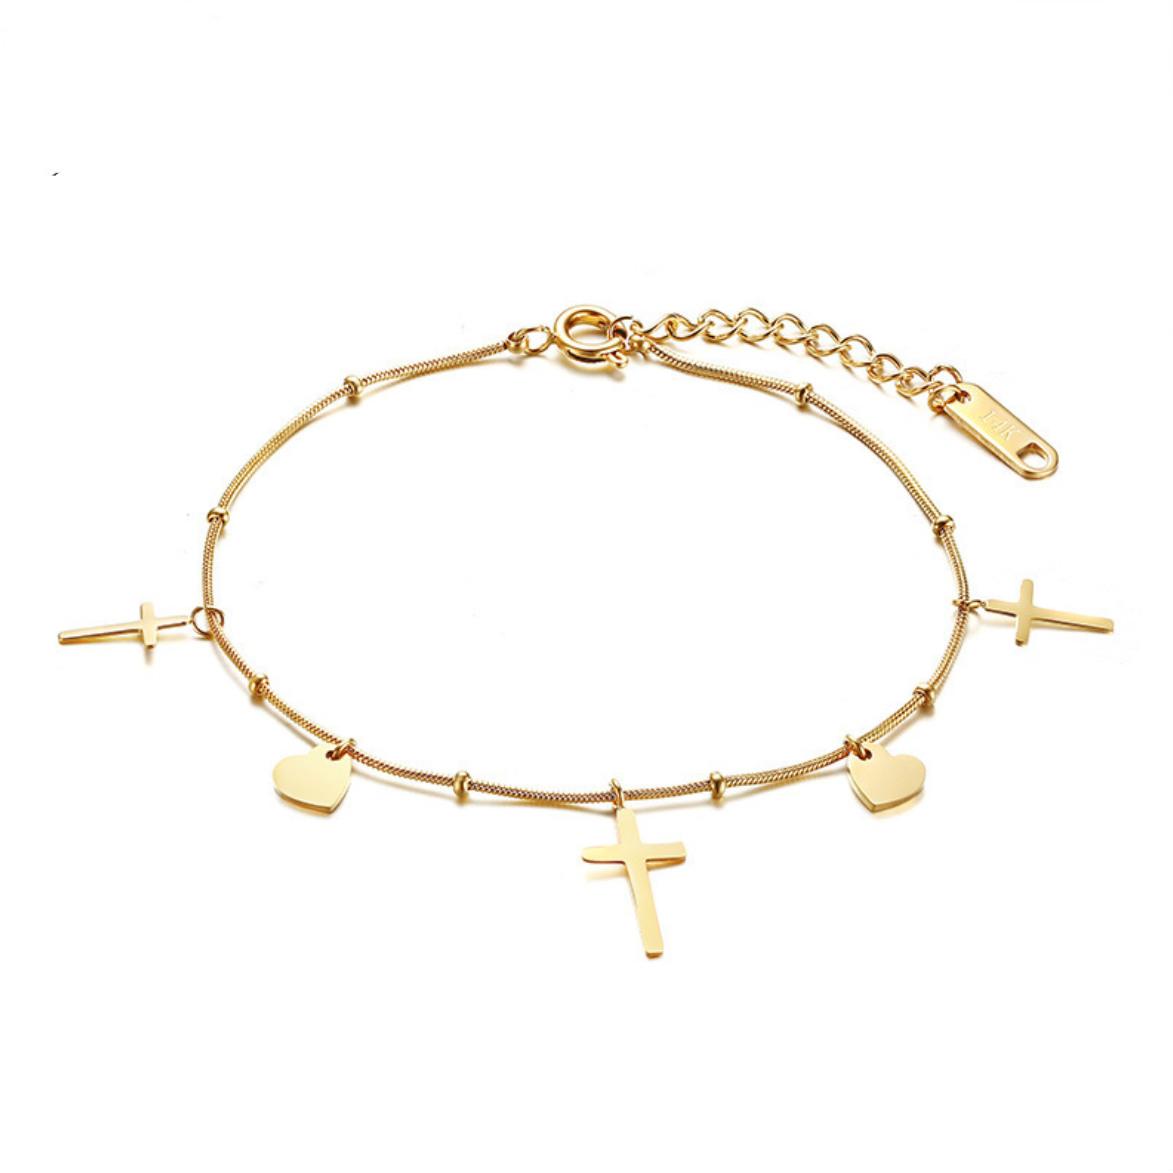 81aaf36e05 Dracula Bone Cross x Heart Bracelet BR-061 | Womandilax™ | Shop Women's  Jewelry Set & Fashion Accessories